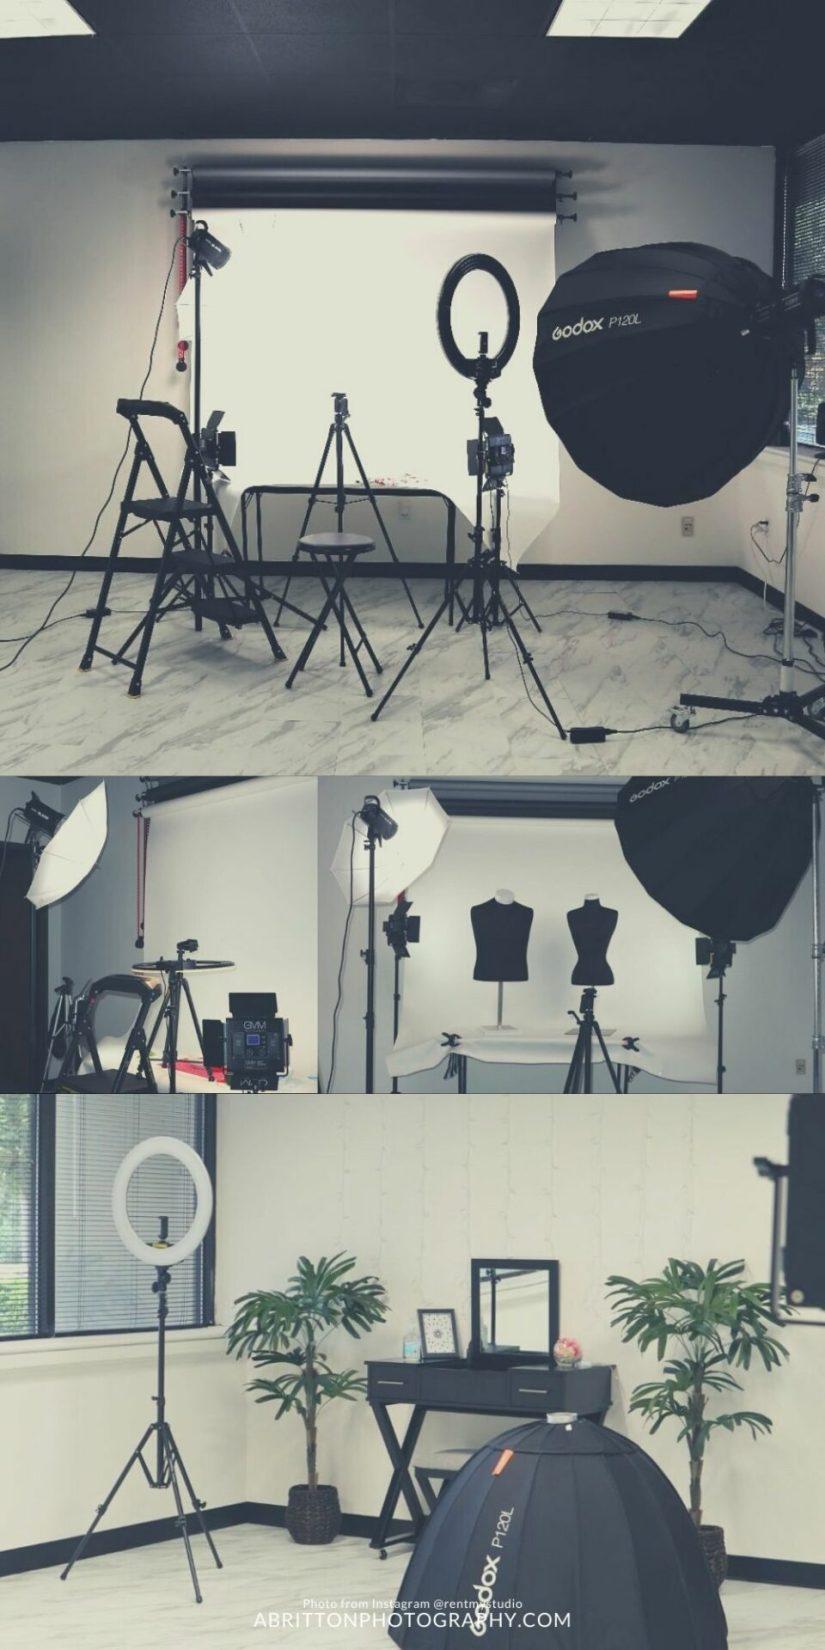 How to Setup a DIY Home Photoshoot Studio Ideas